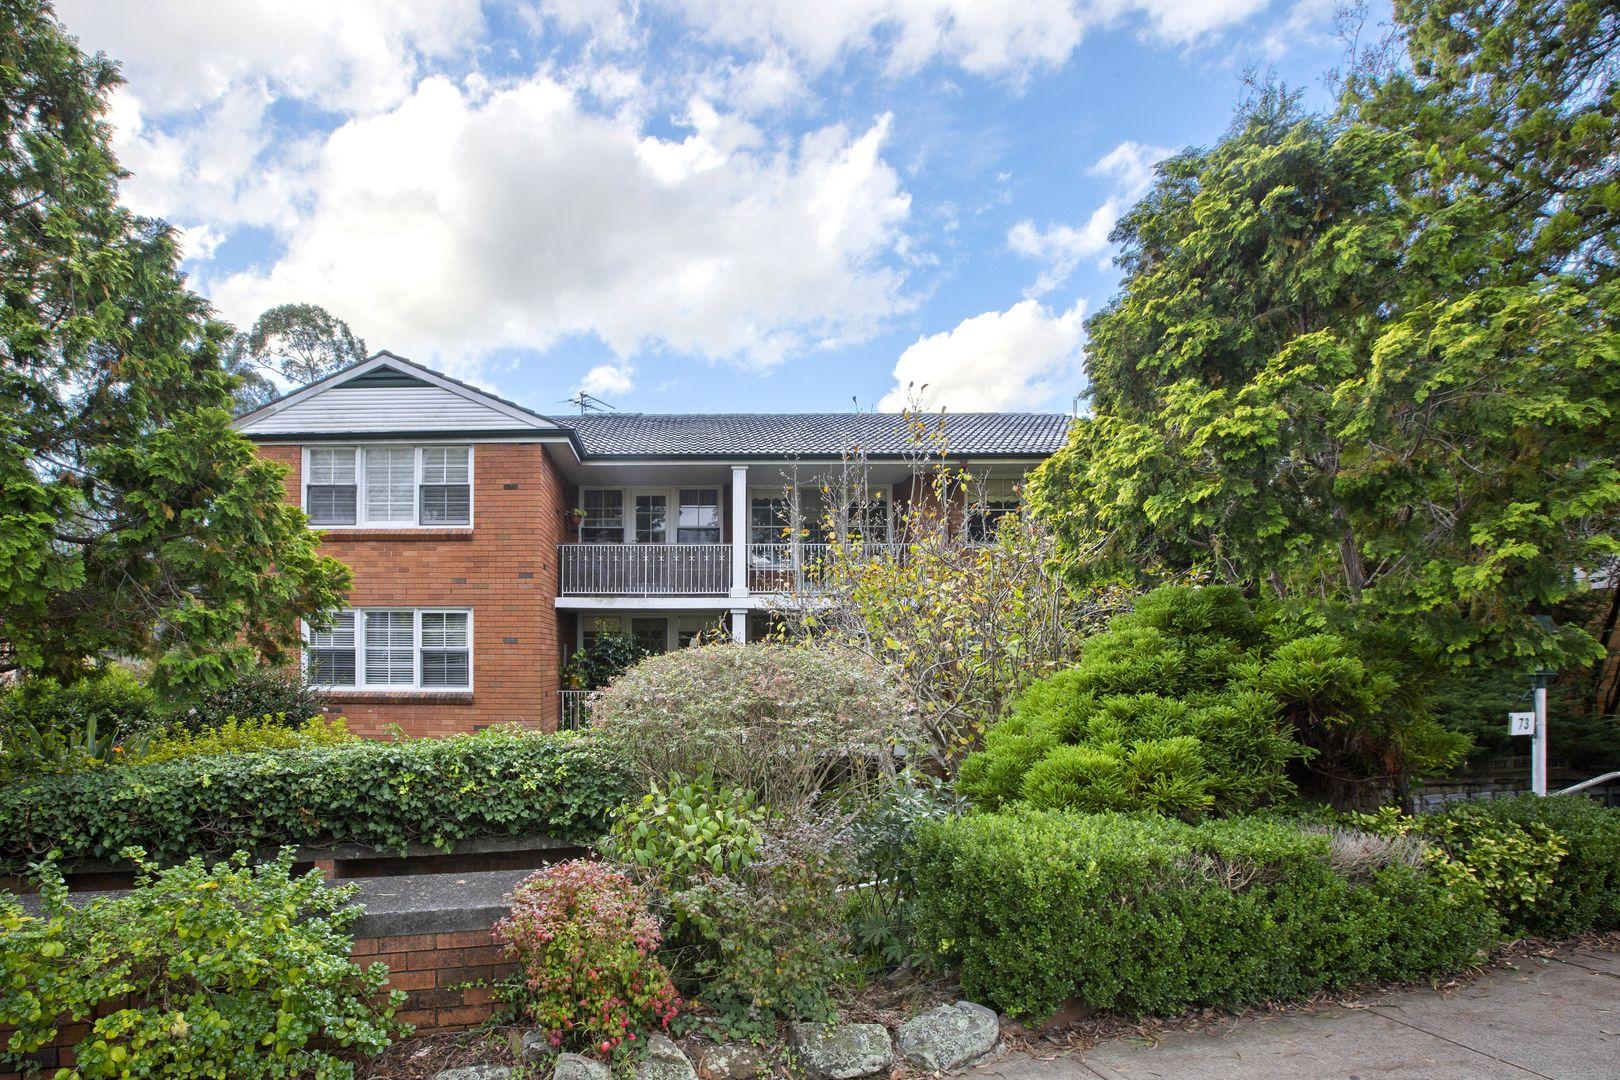 10/73-75 Burns Bay Road, Lane Cove NSW 2066, Image 0